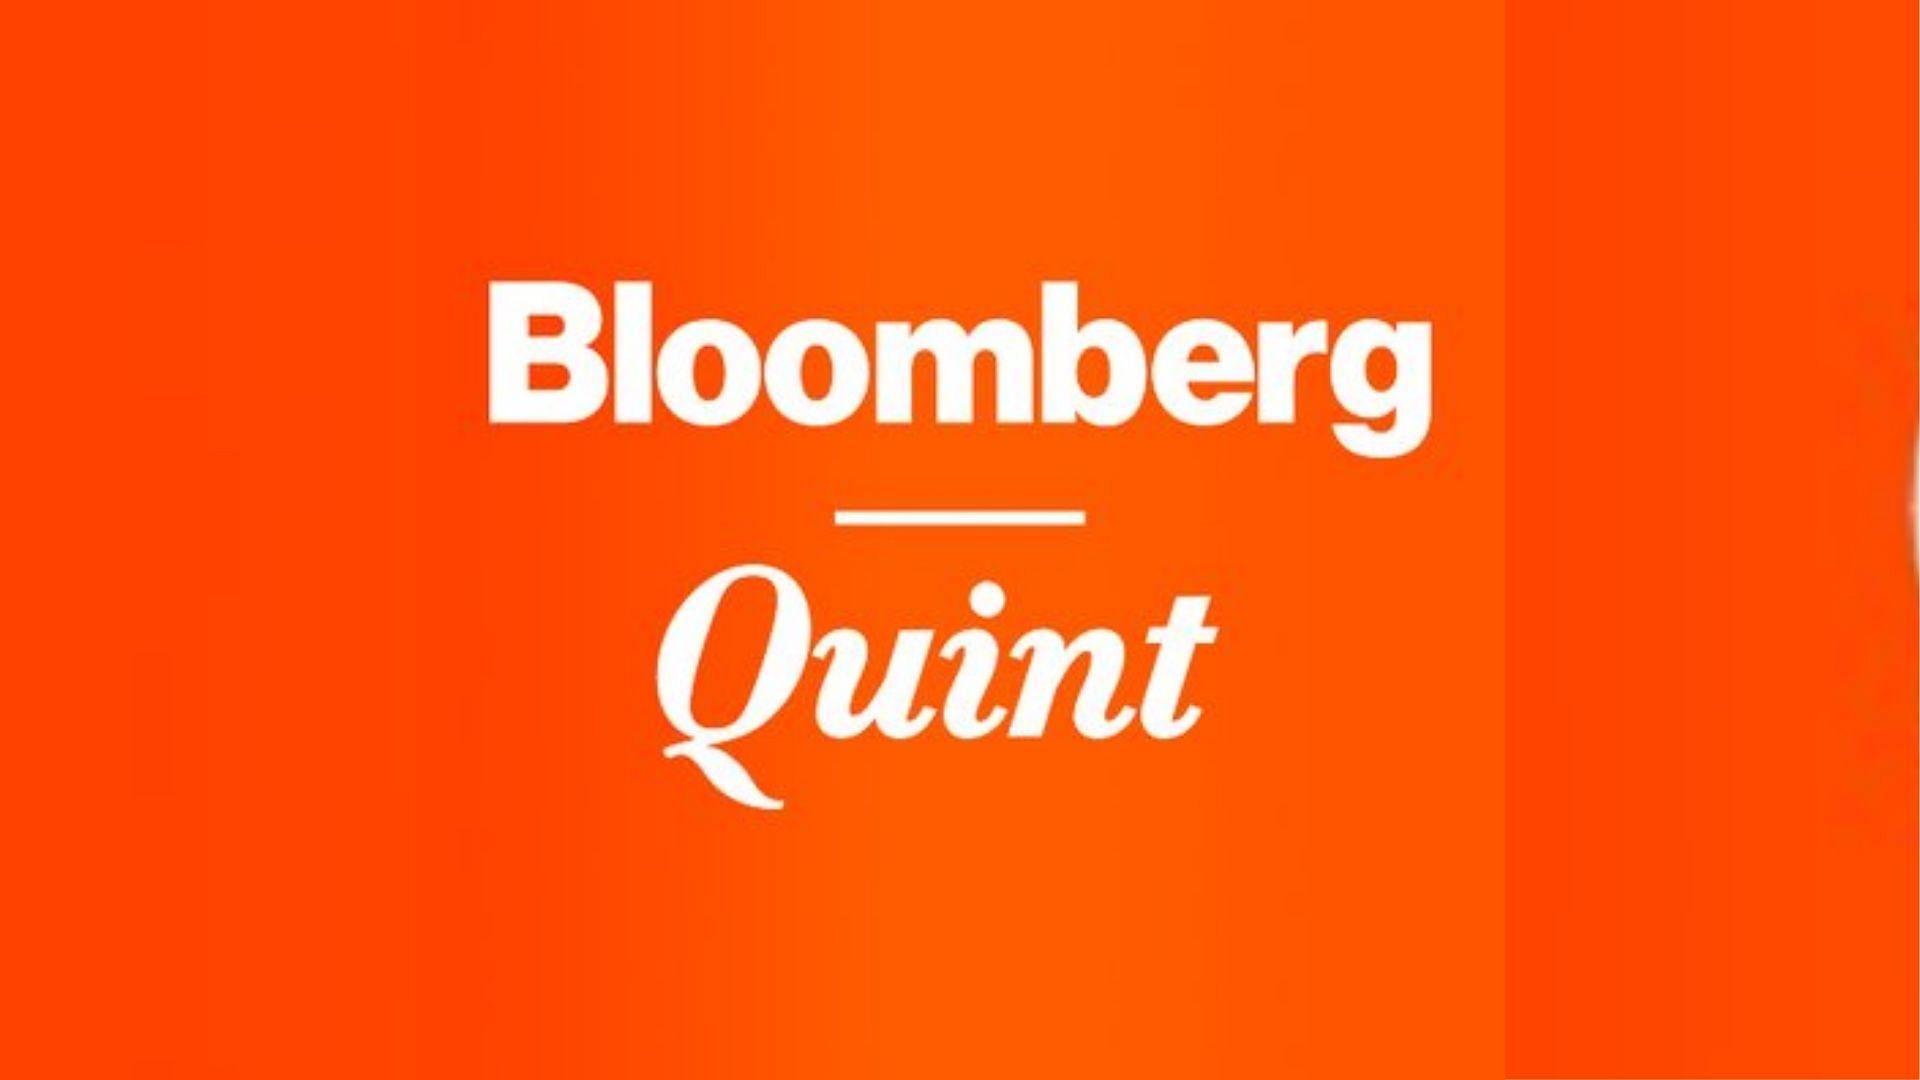 Bloombergquint?blur=25